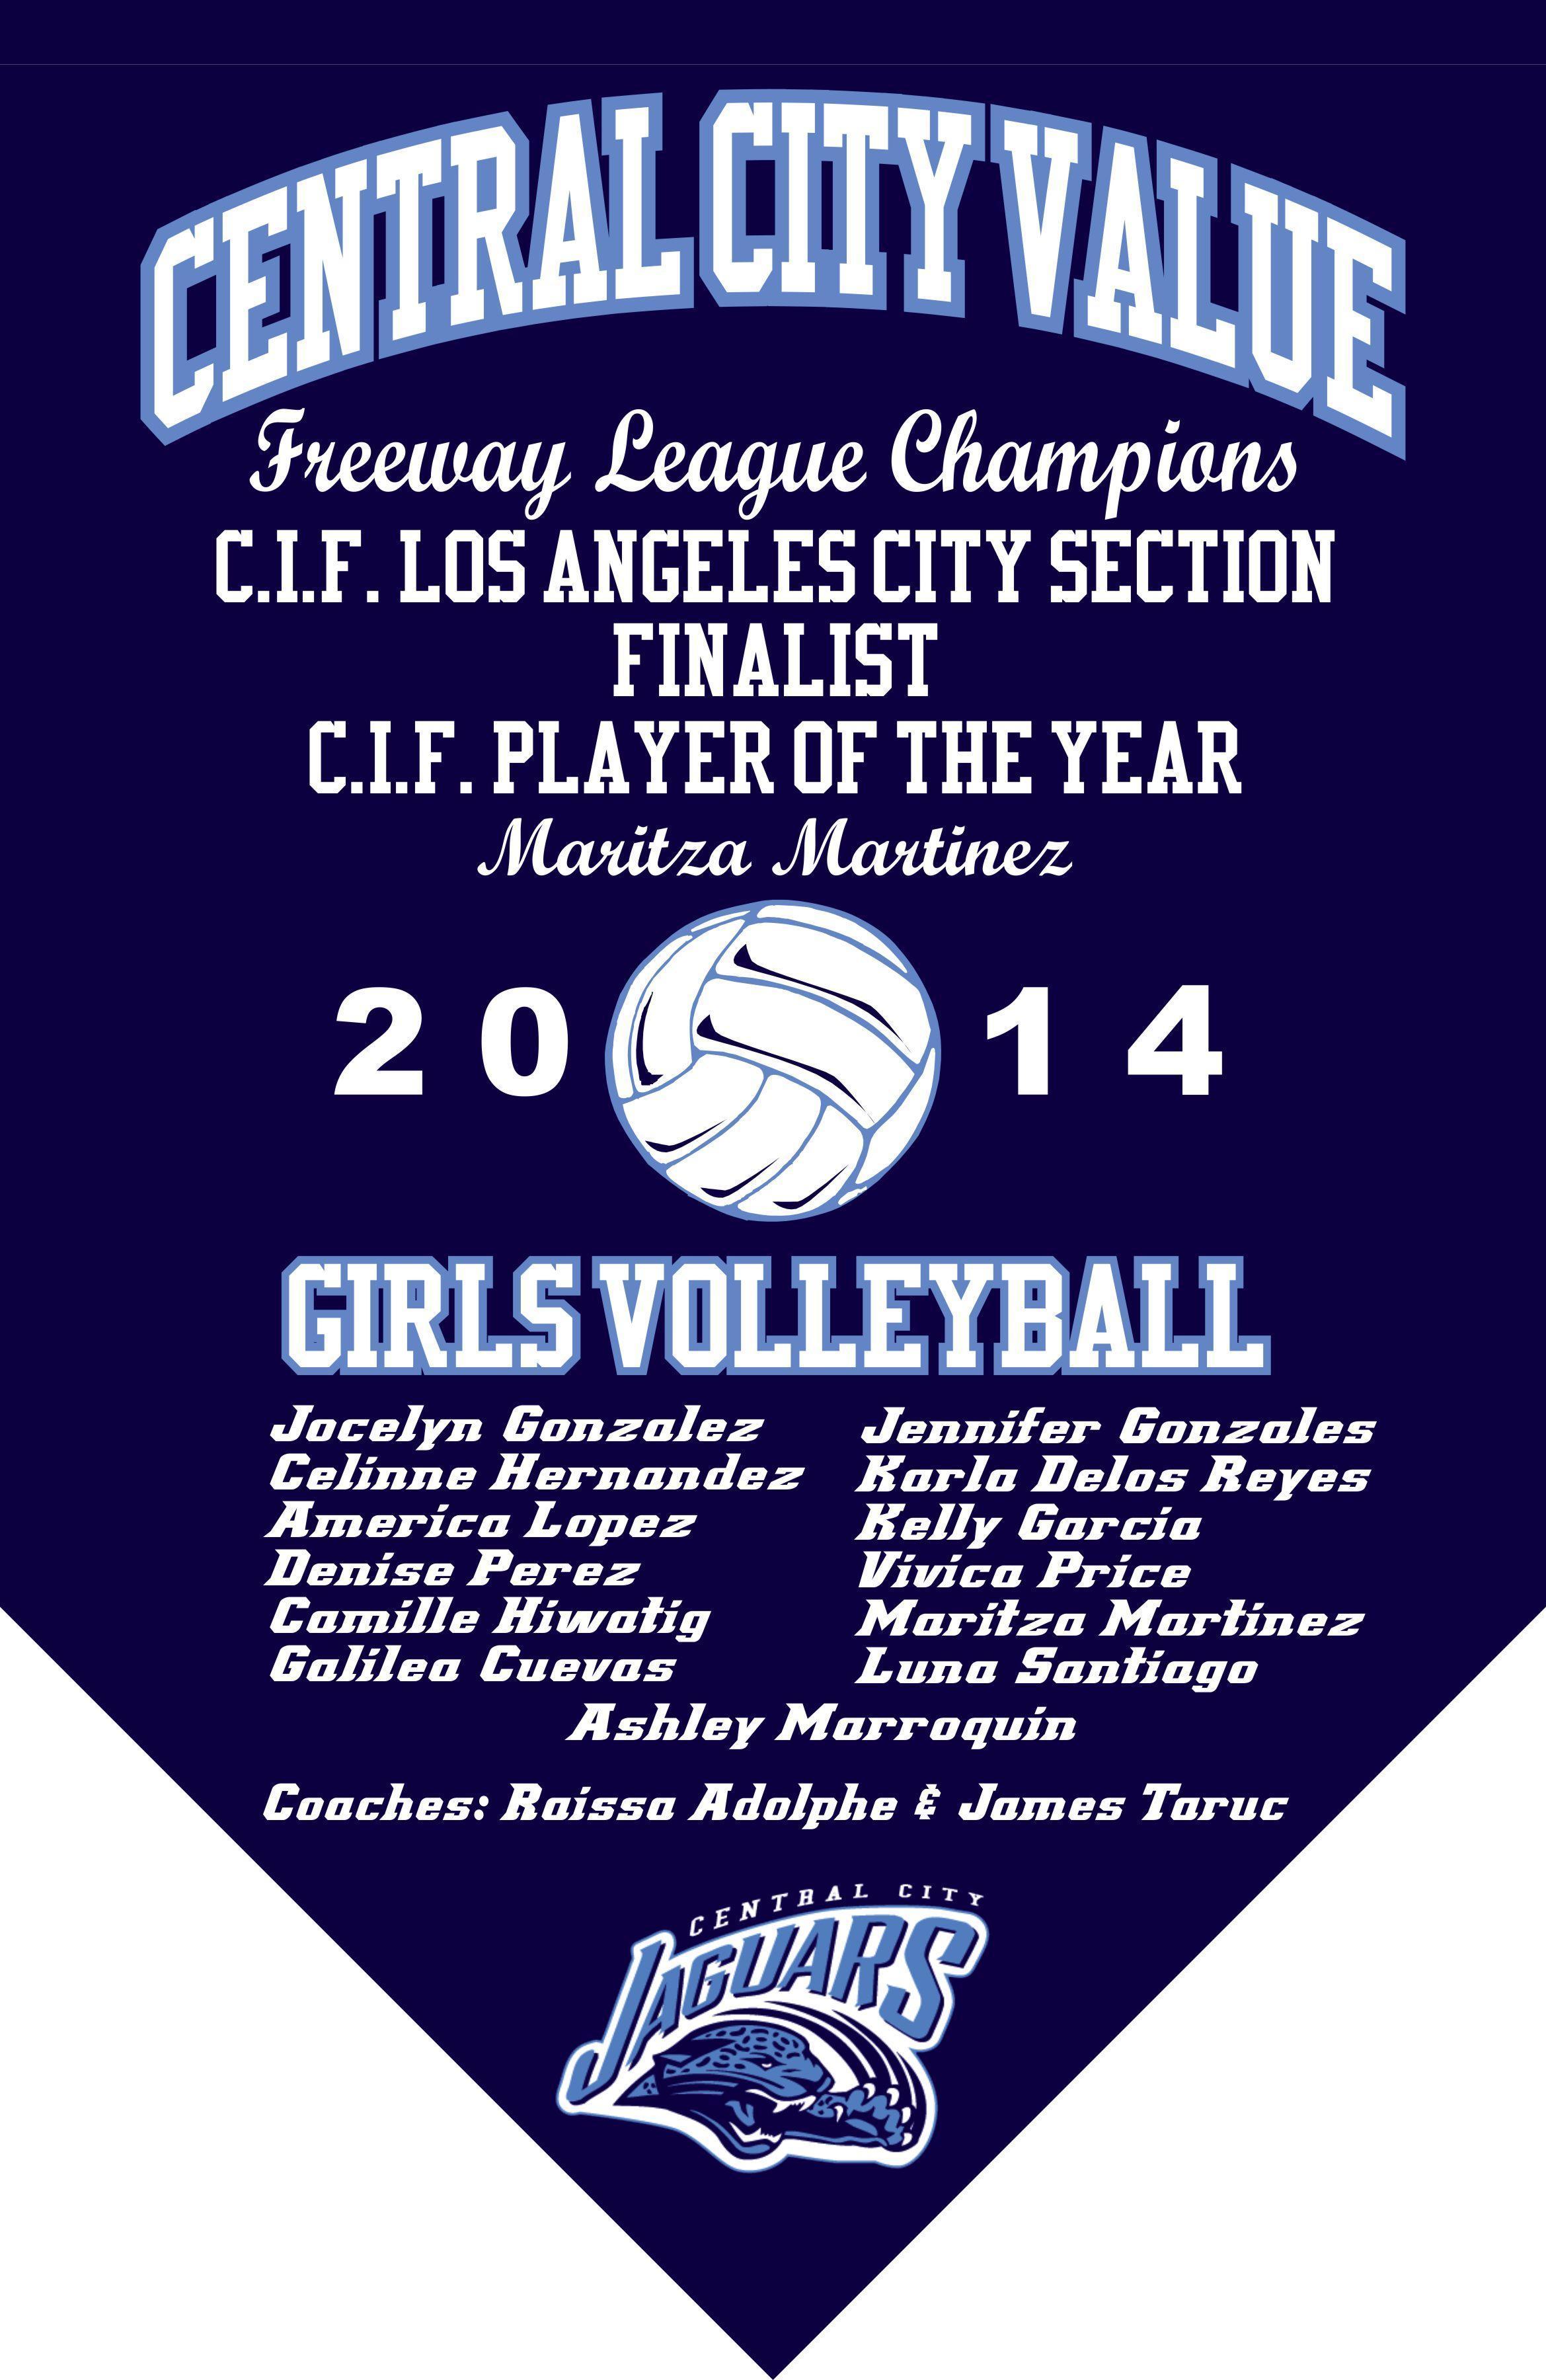 2014 Girls Volleyball Finalists Banner